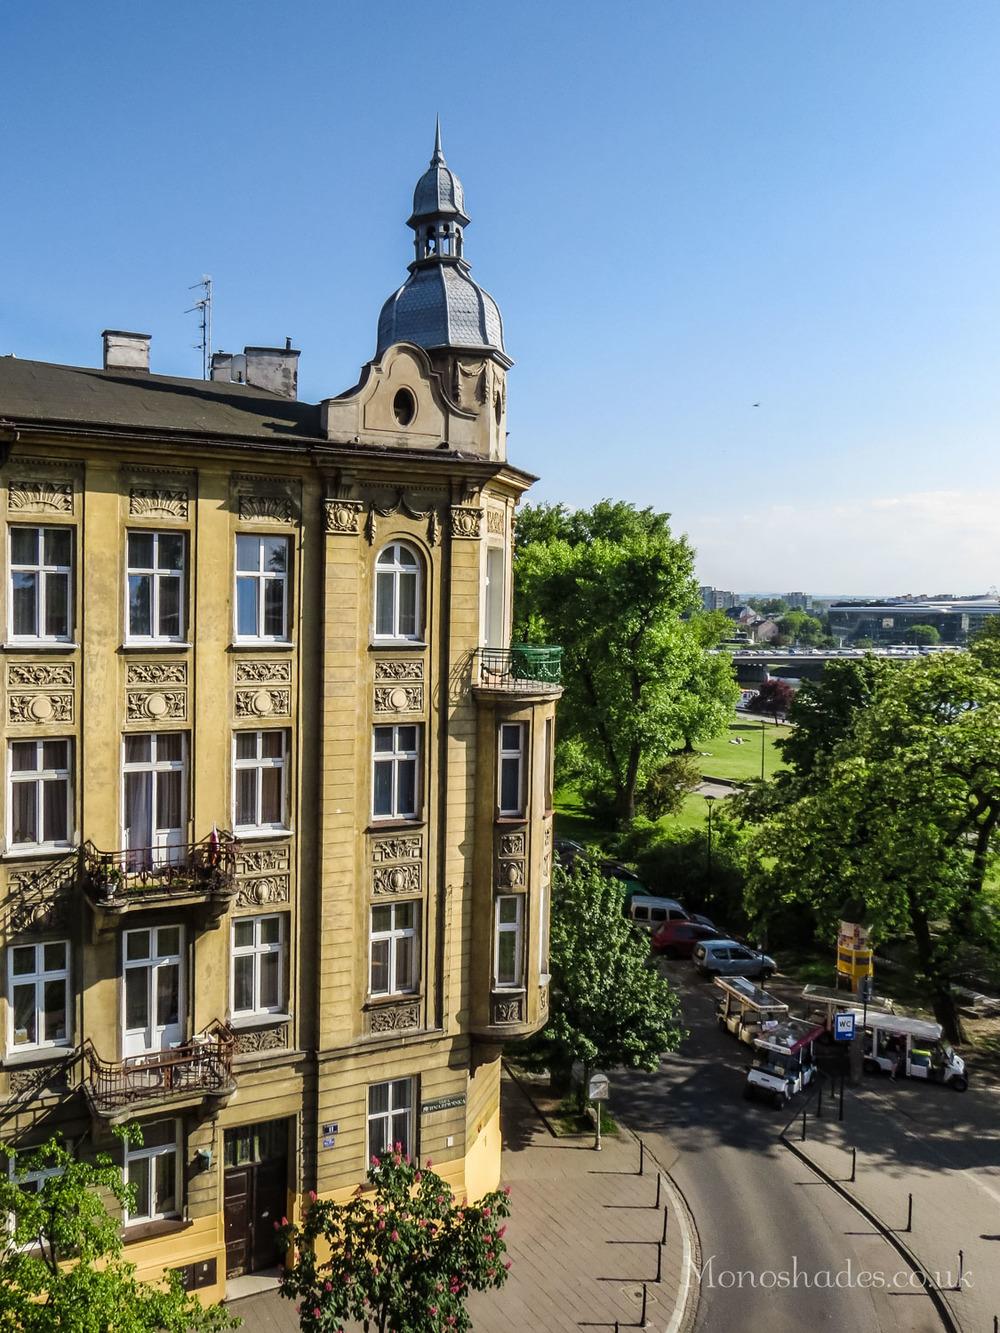 A building on the corner of Smocza and Bernardynska streets